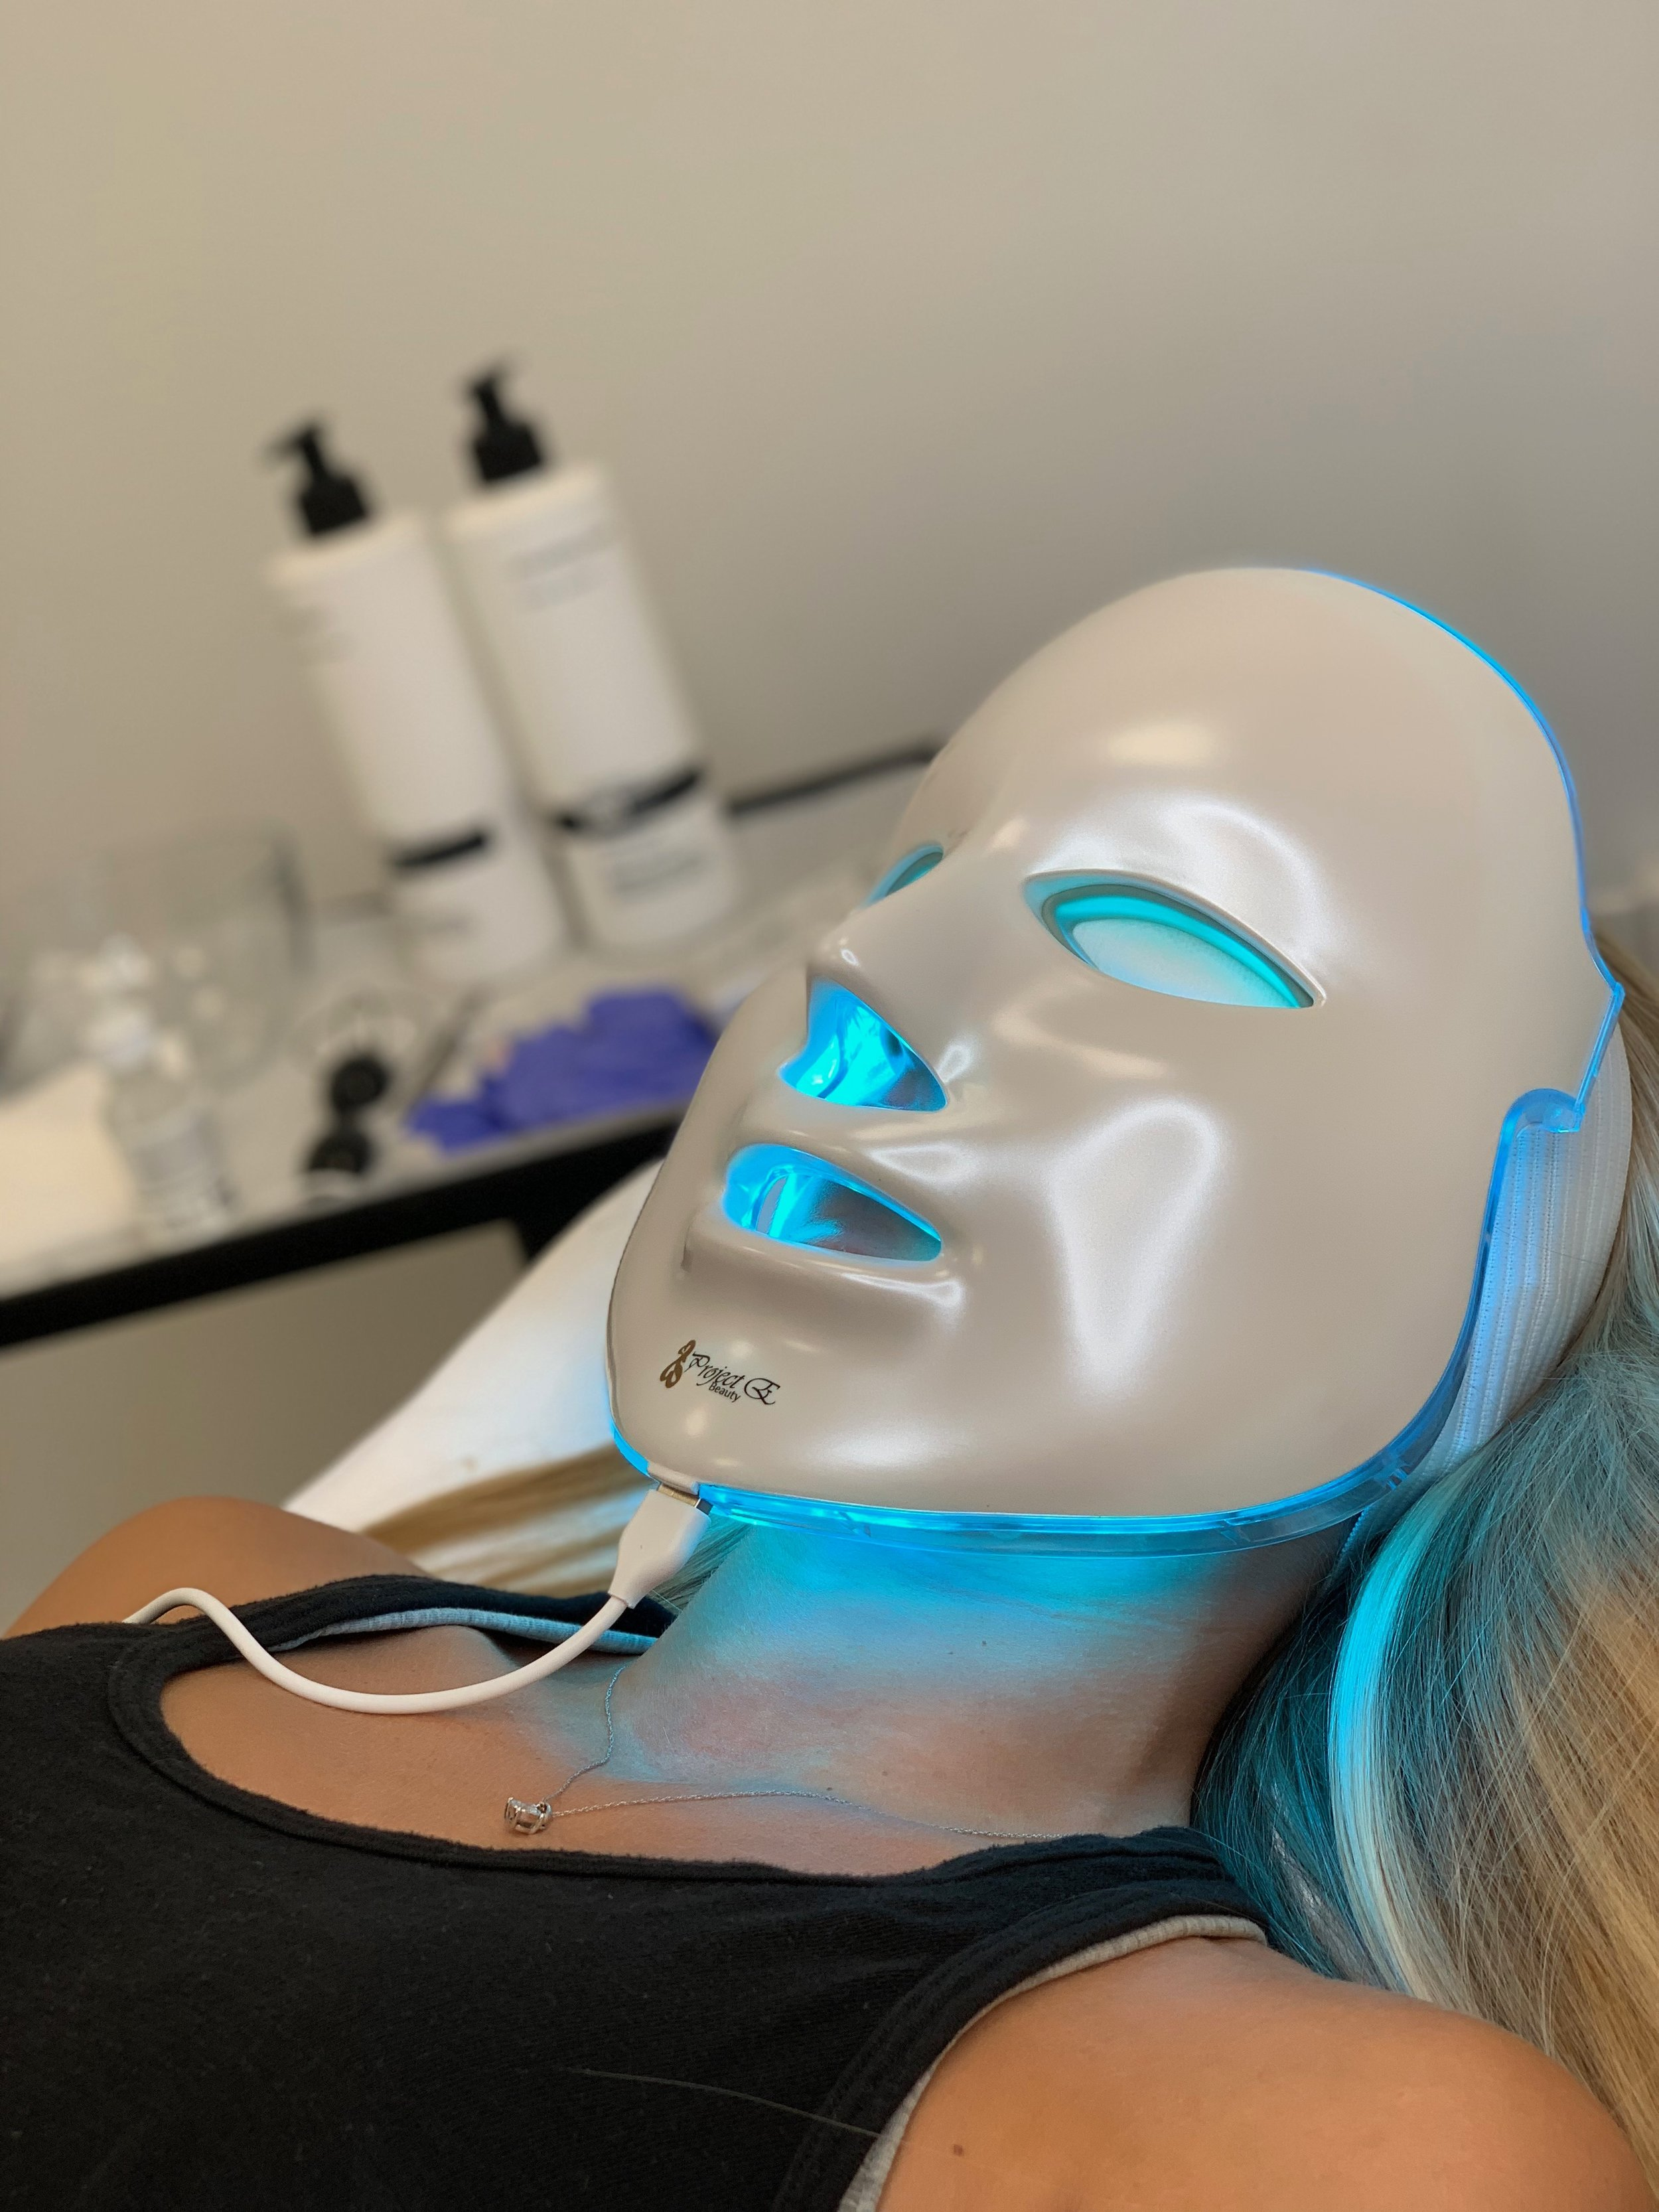 LED Blue Light Session to Target Acne